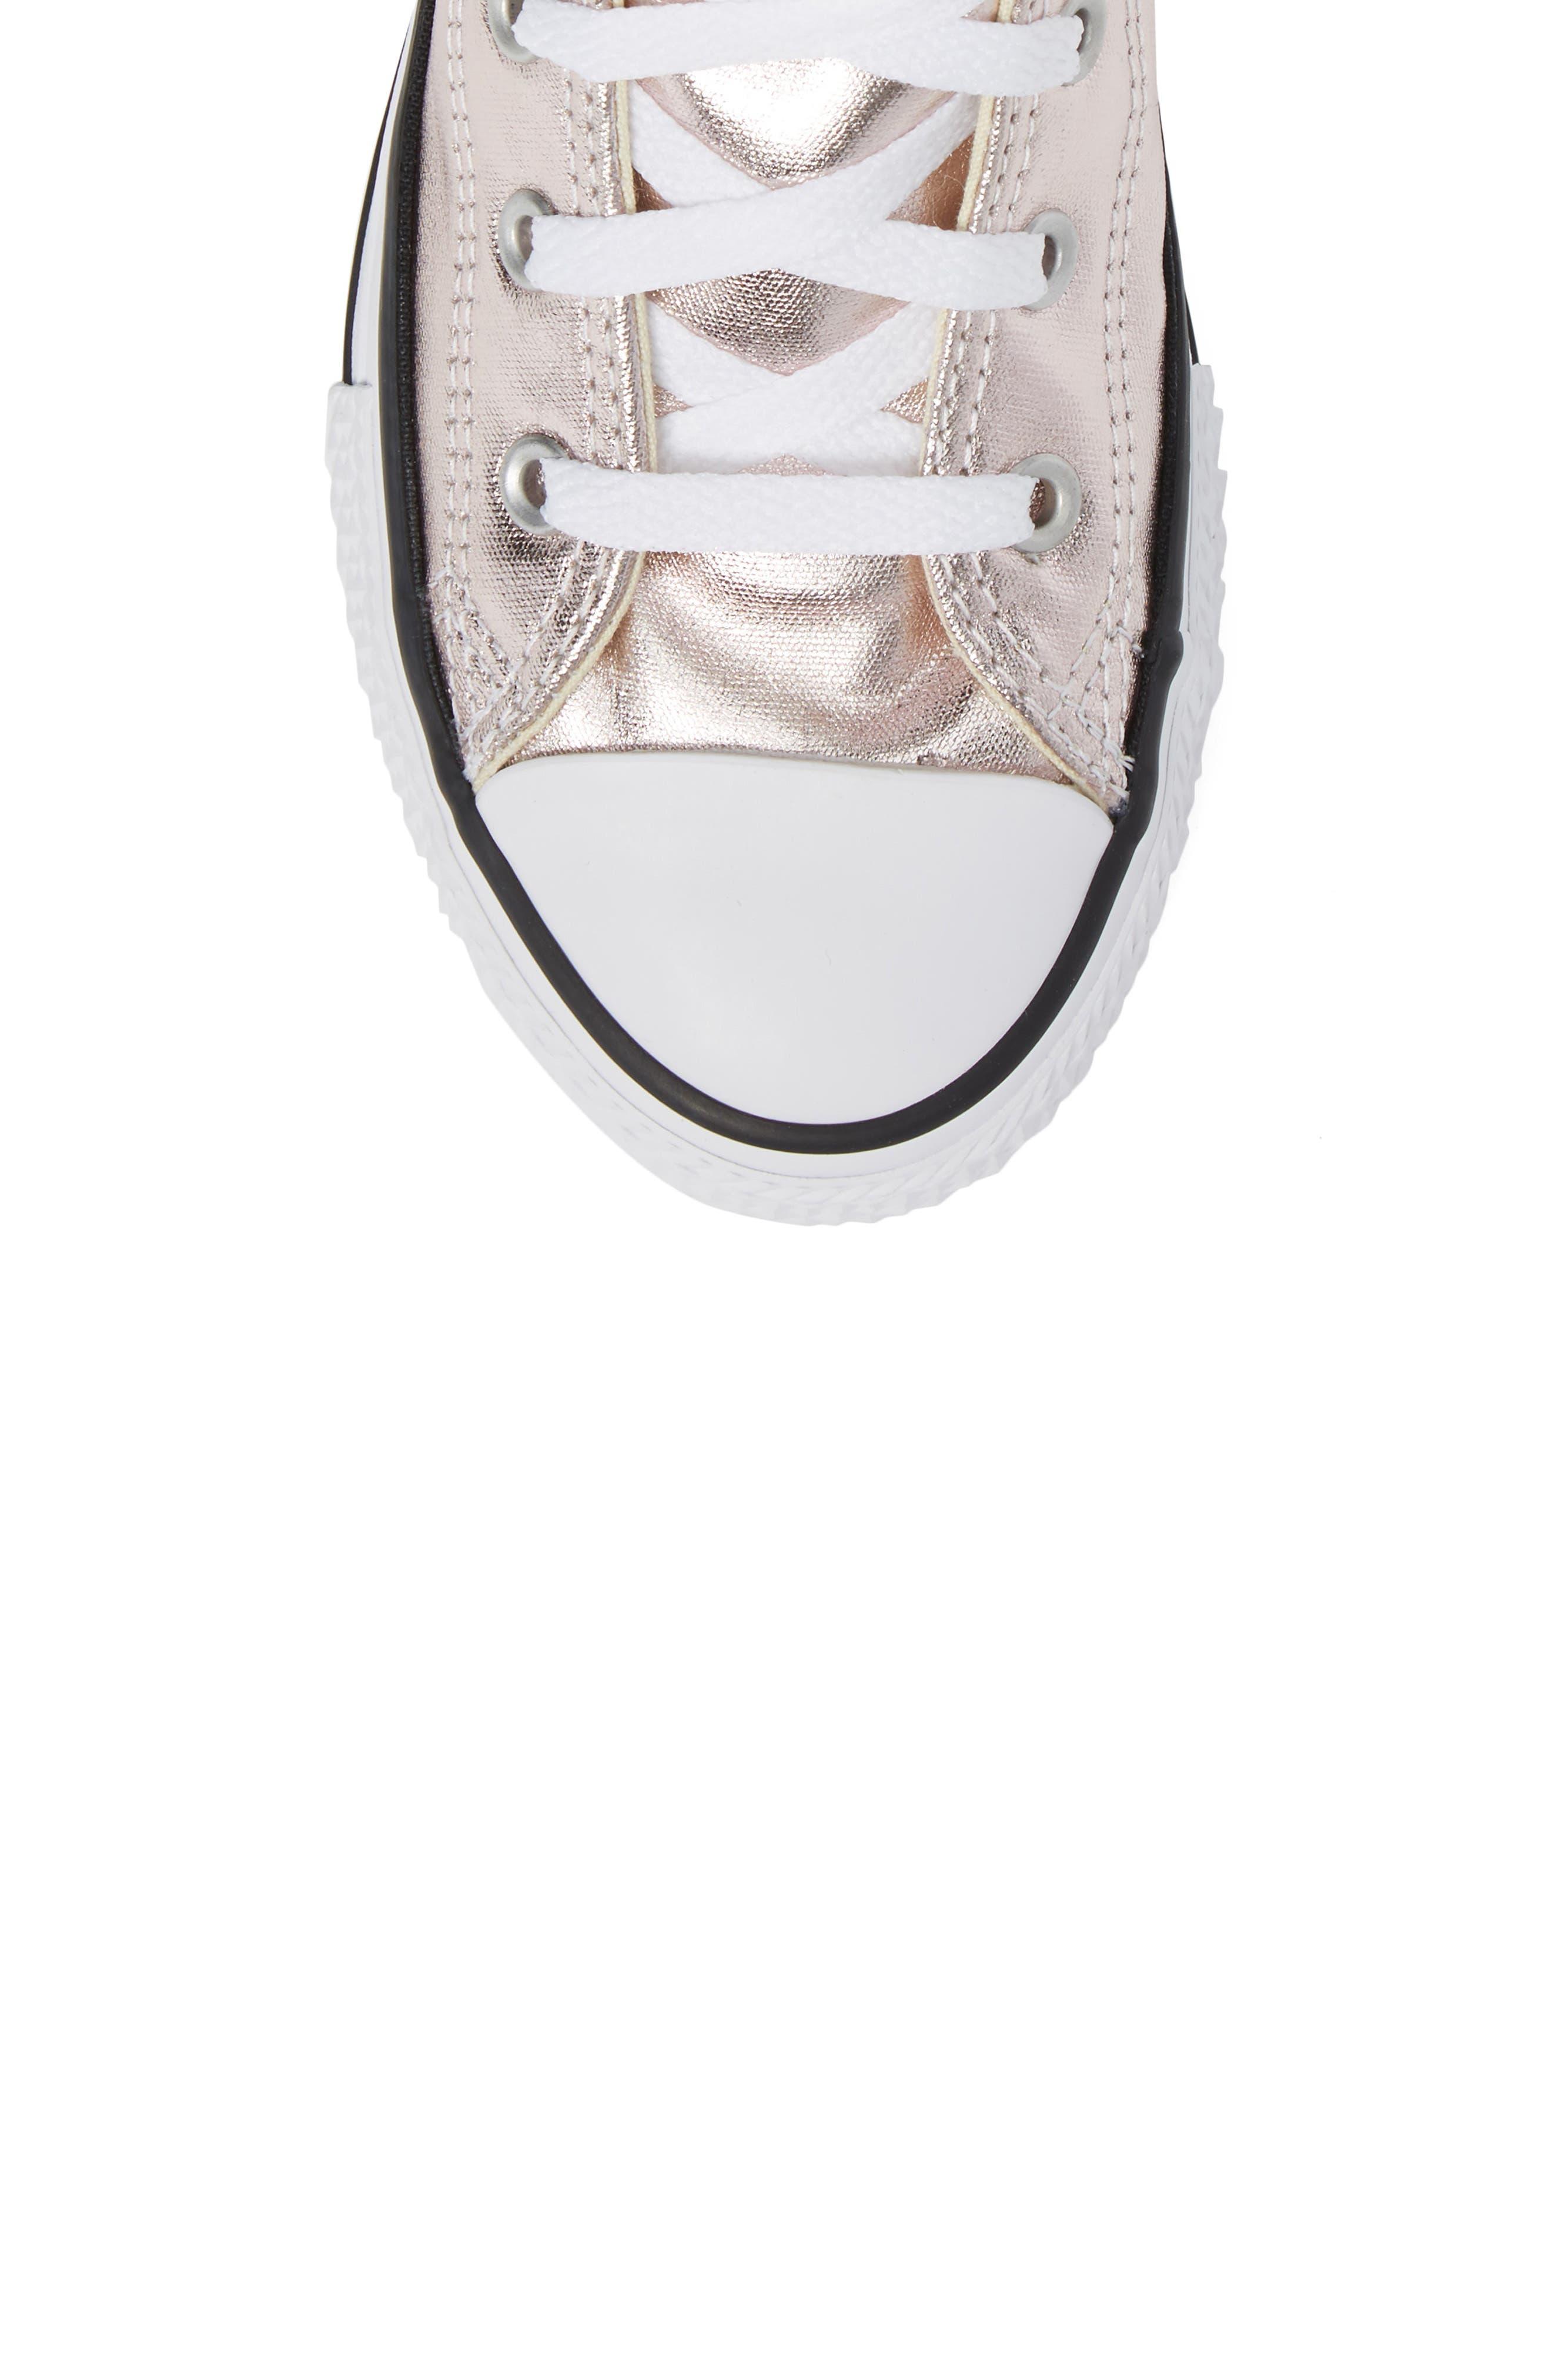 Chuck Taylor<sup>®</sup> All Star<sup>®</sup> Seasonal Metallic High Top Sneaker,                             Alternate thumbnail 5, color,                             Rose Quartz/ White Canvas